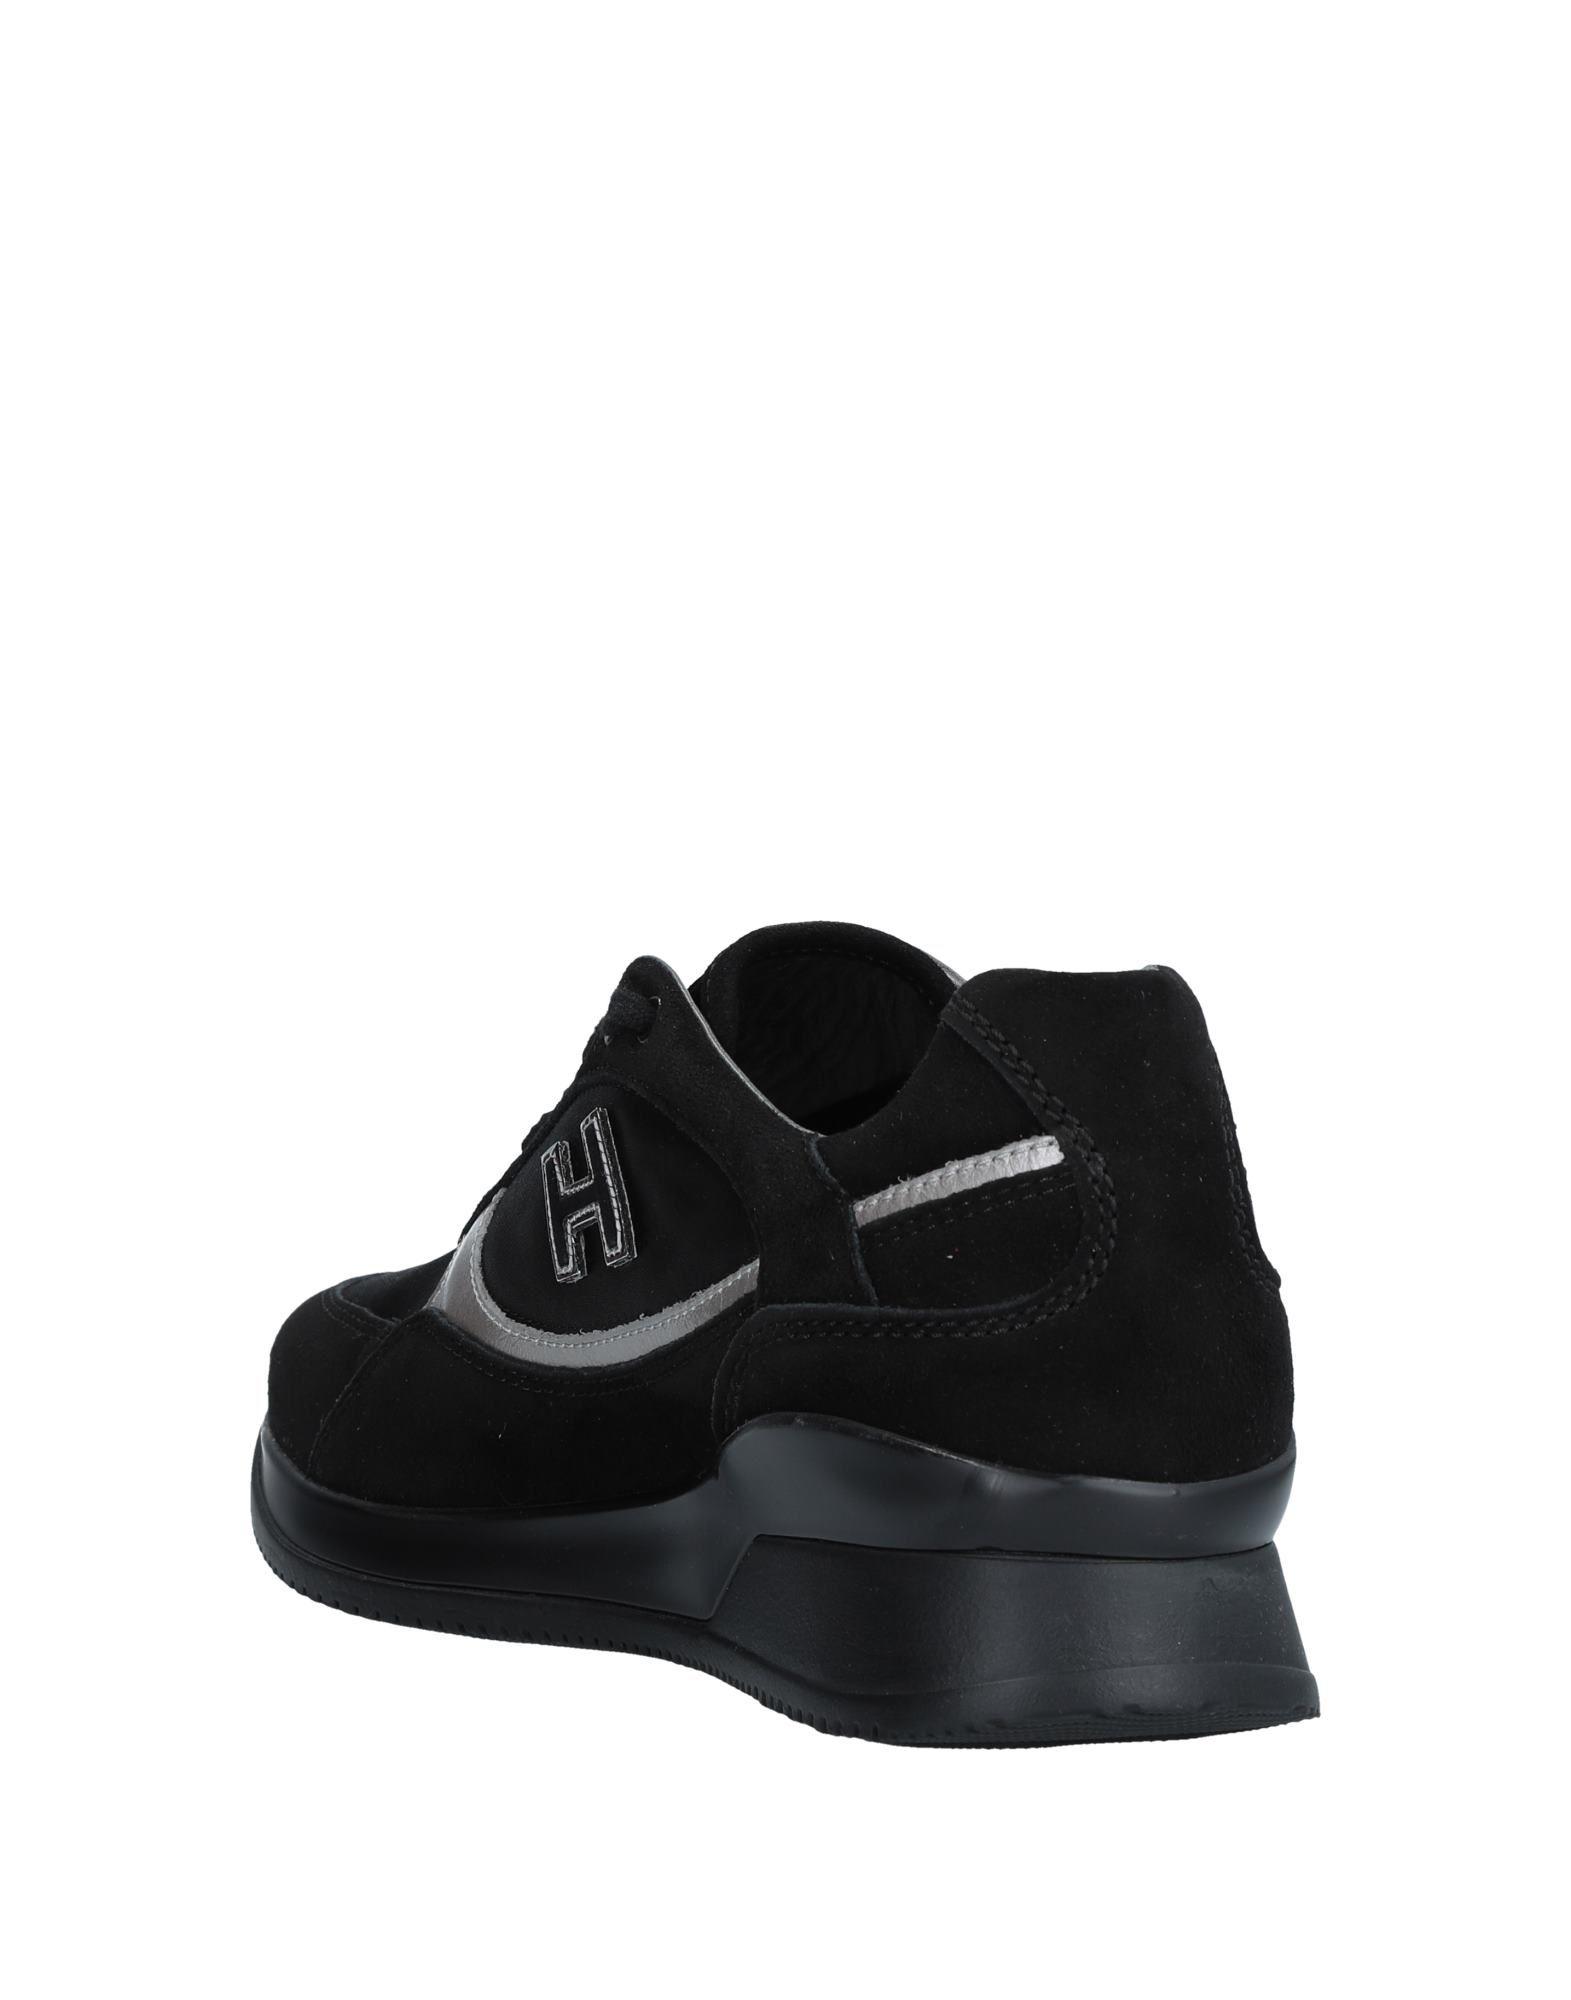 Hogan Turnschuhes 11541850GMGut Damen 11541850GMGut Turnschuhes aussehende strapazierfähige Schuhe d28c50